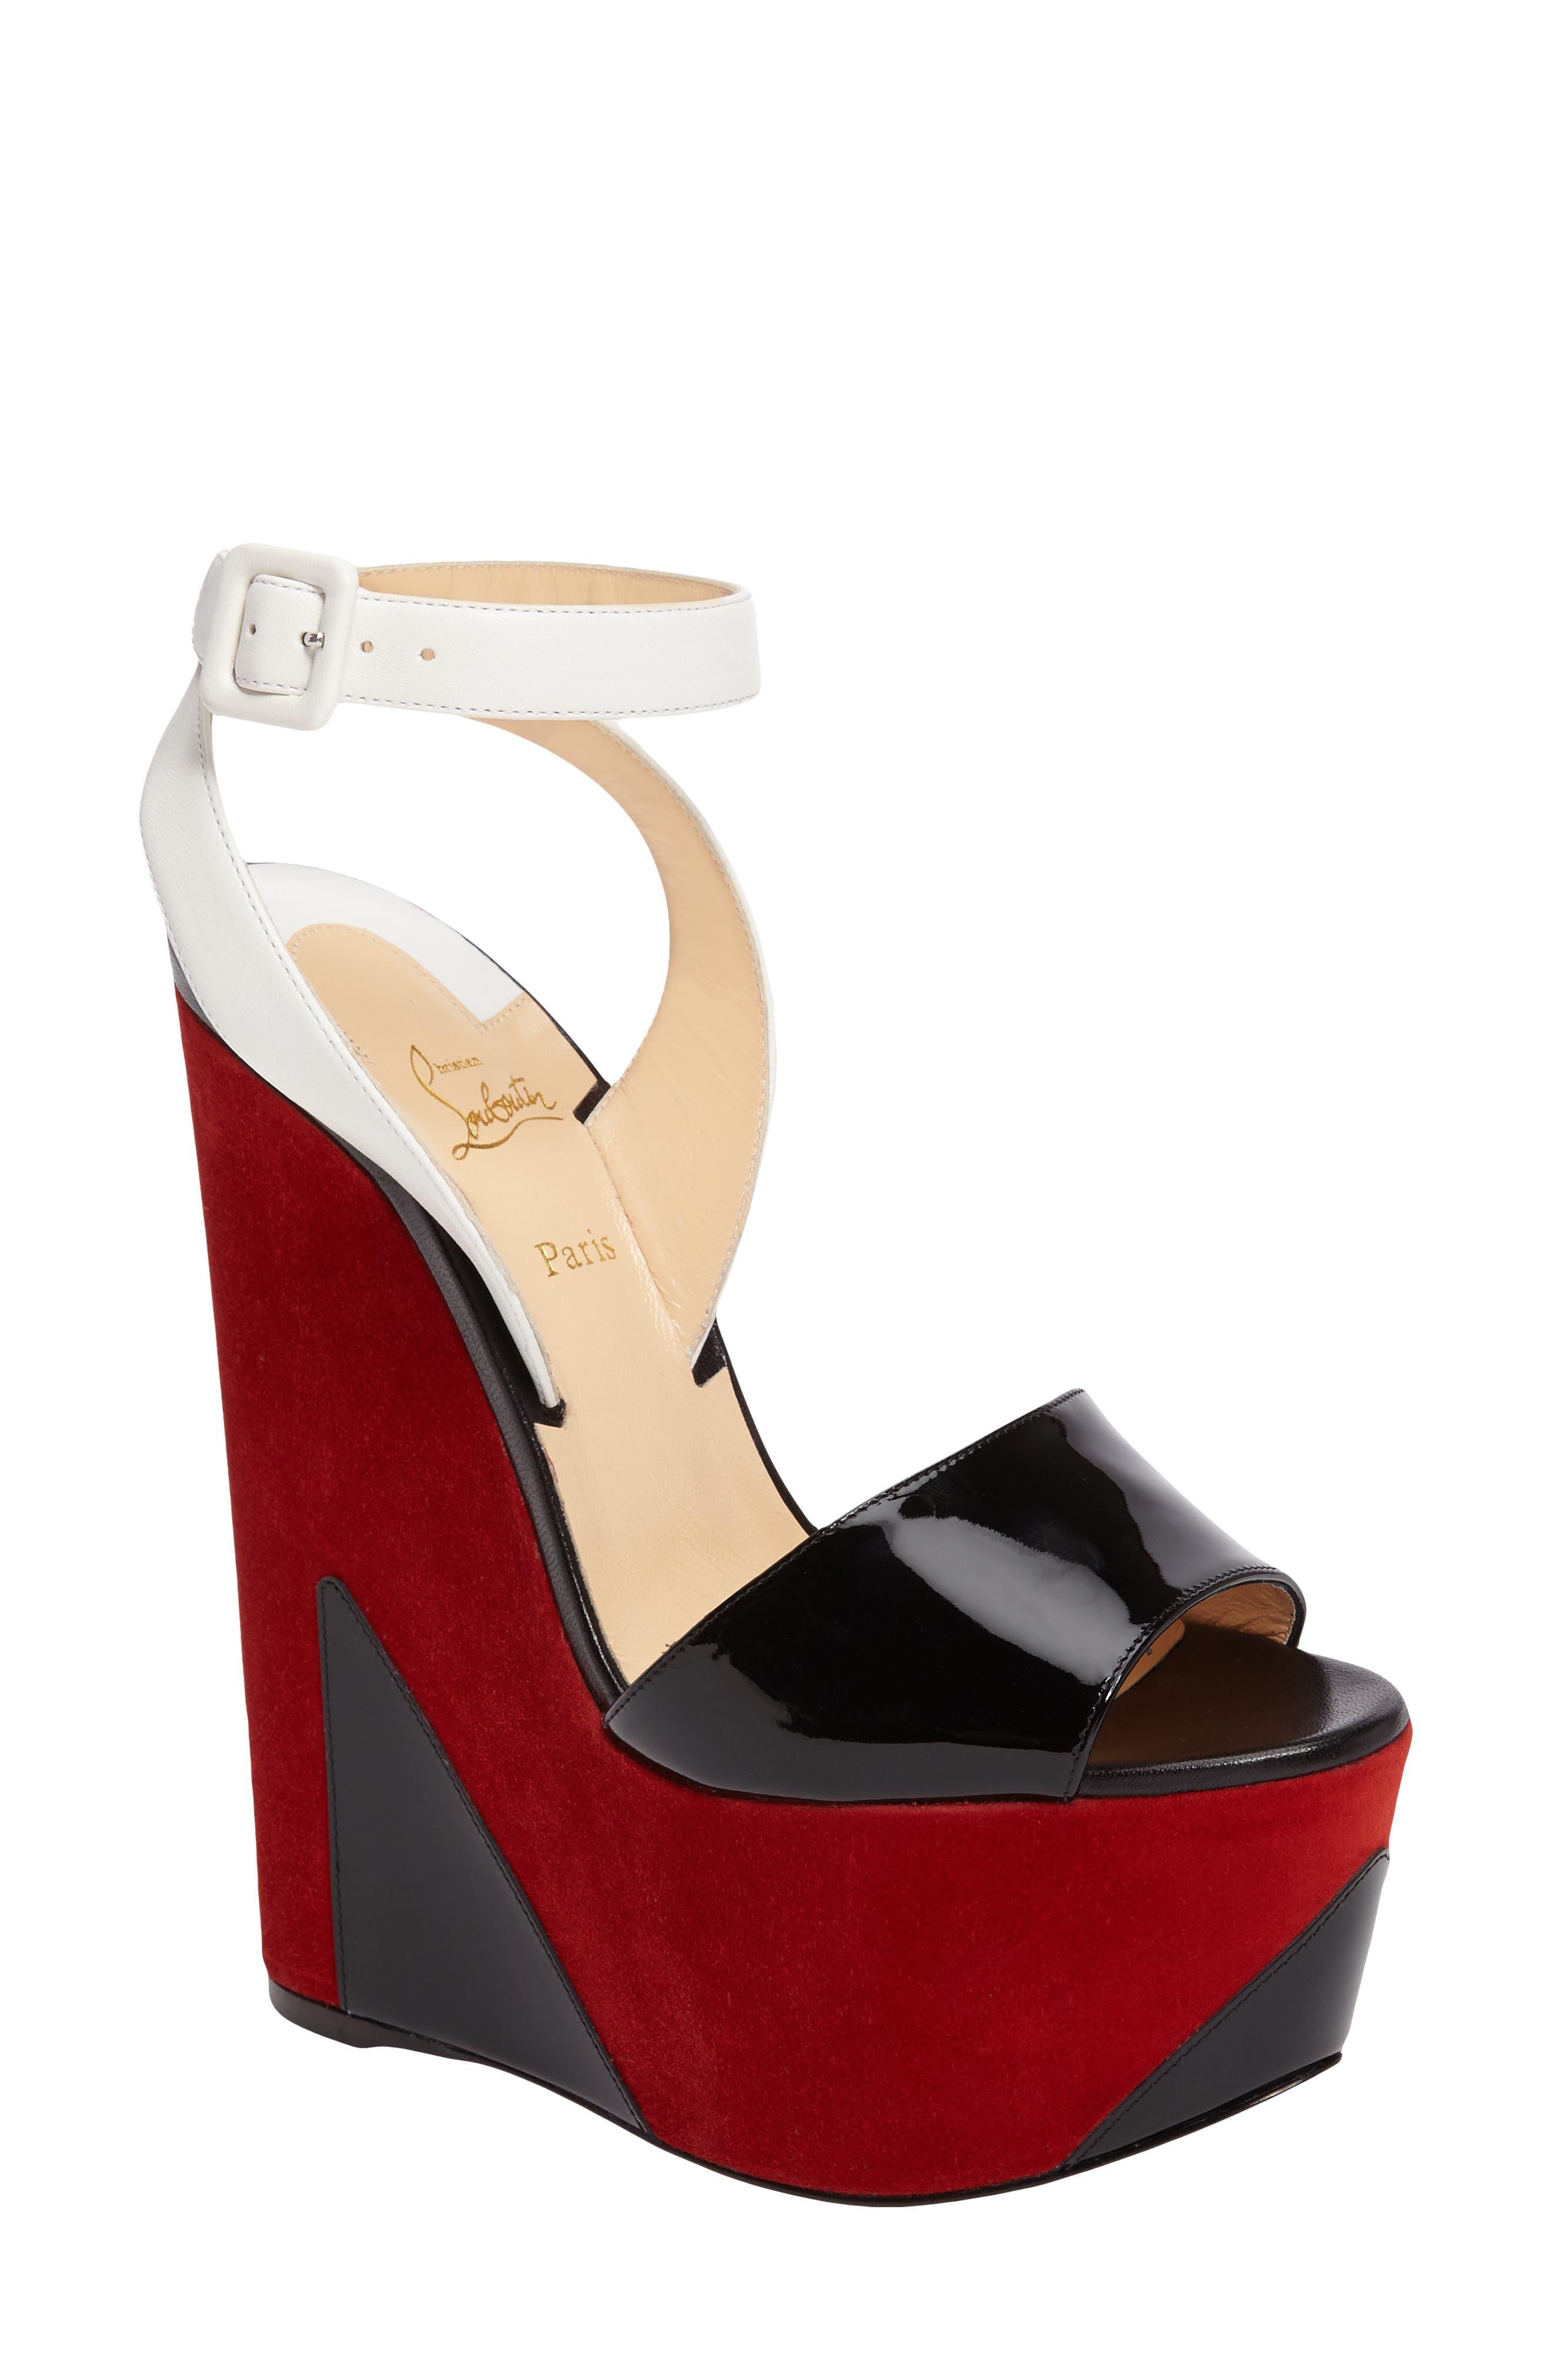 Main Image - Christian Louboutin Tromploia Platform Sandal (Women)